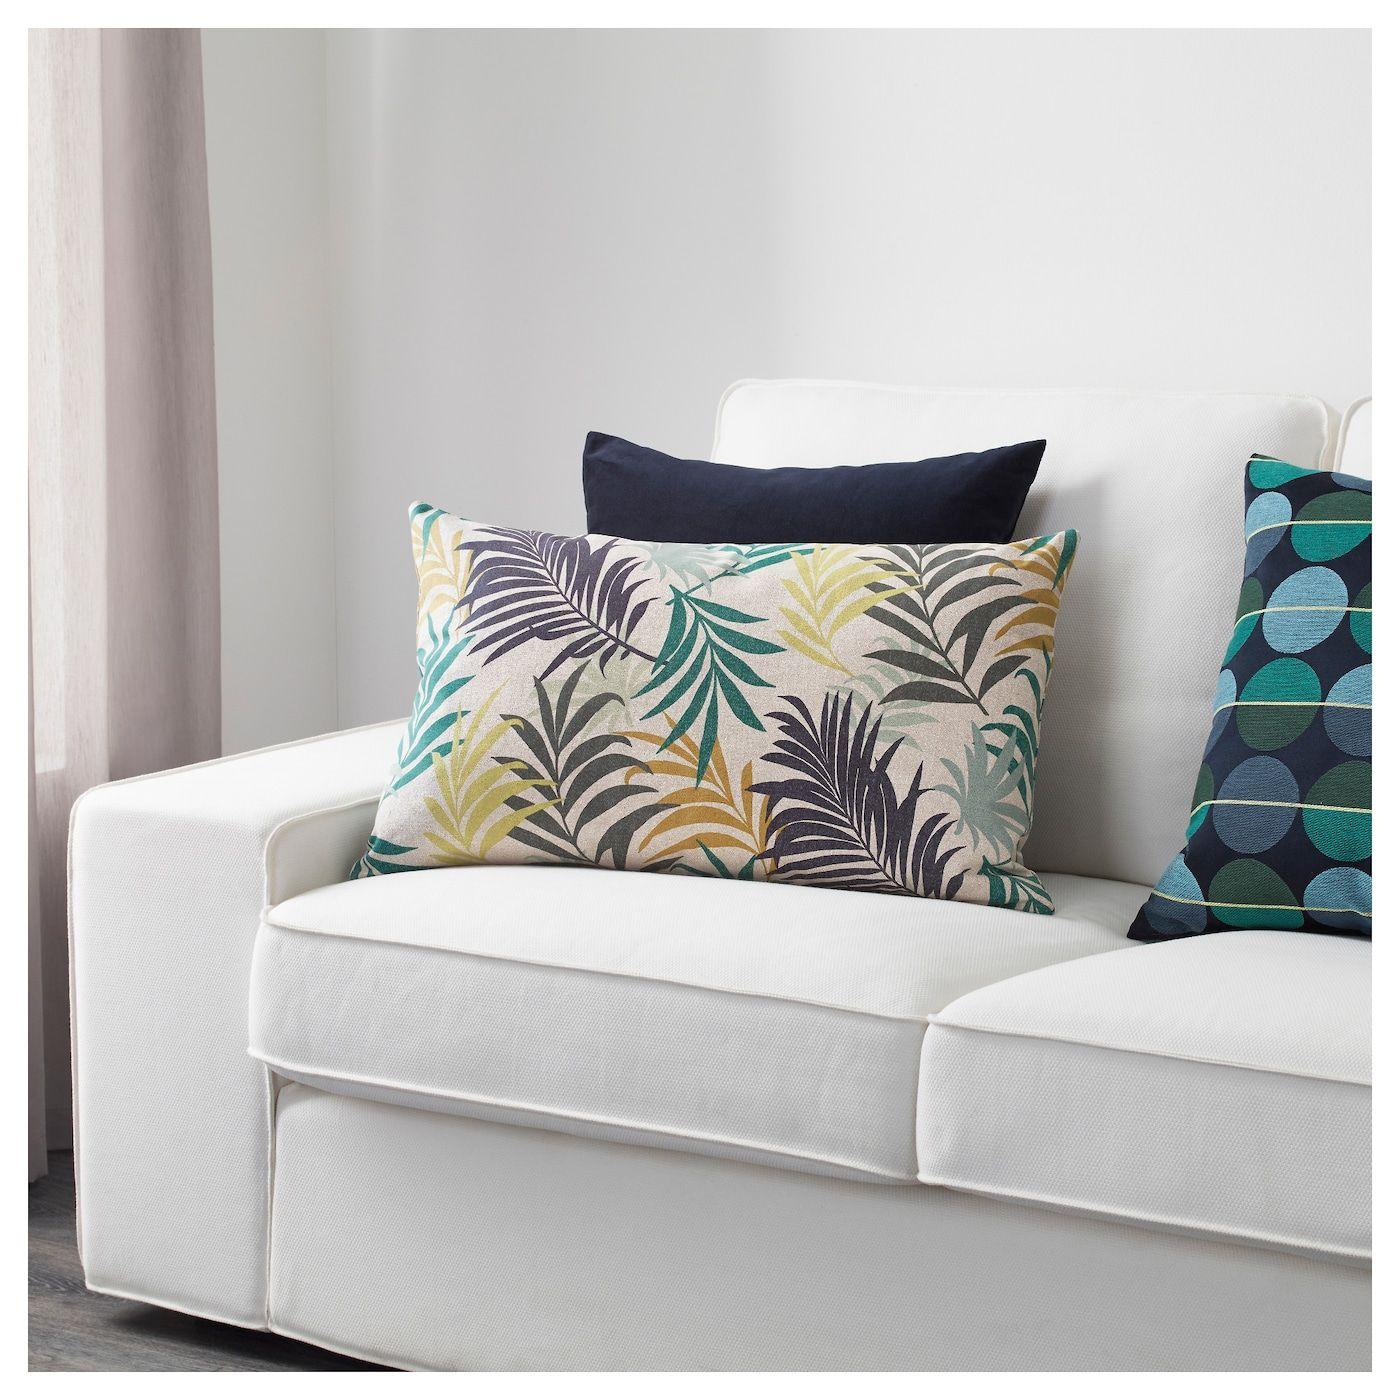 GILLHOV Cushion cover Gillhov multicolor 16x26